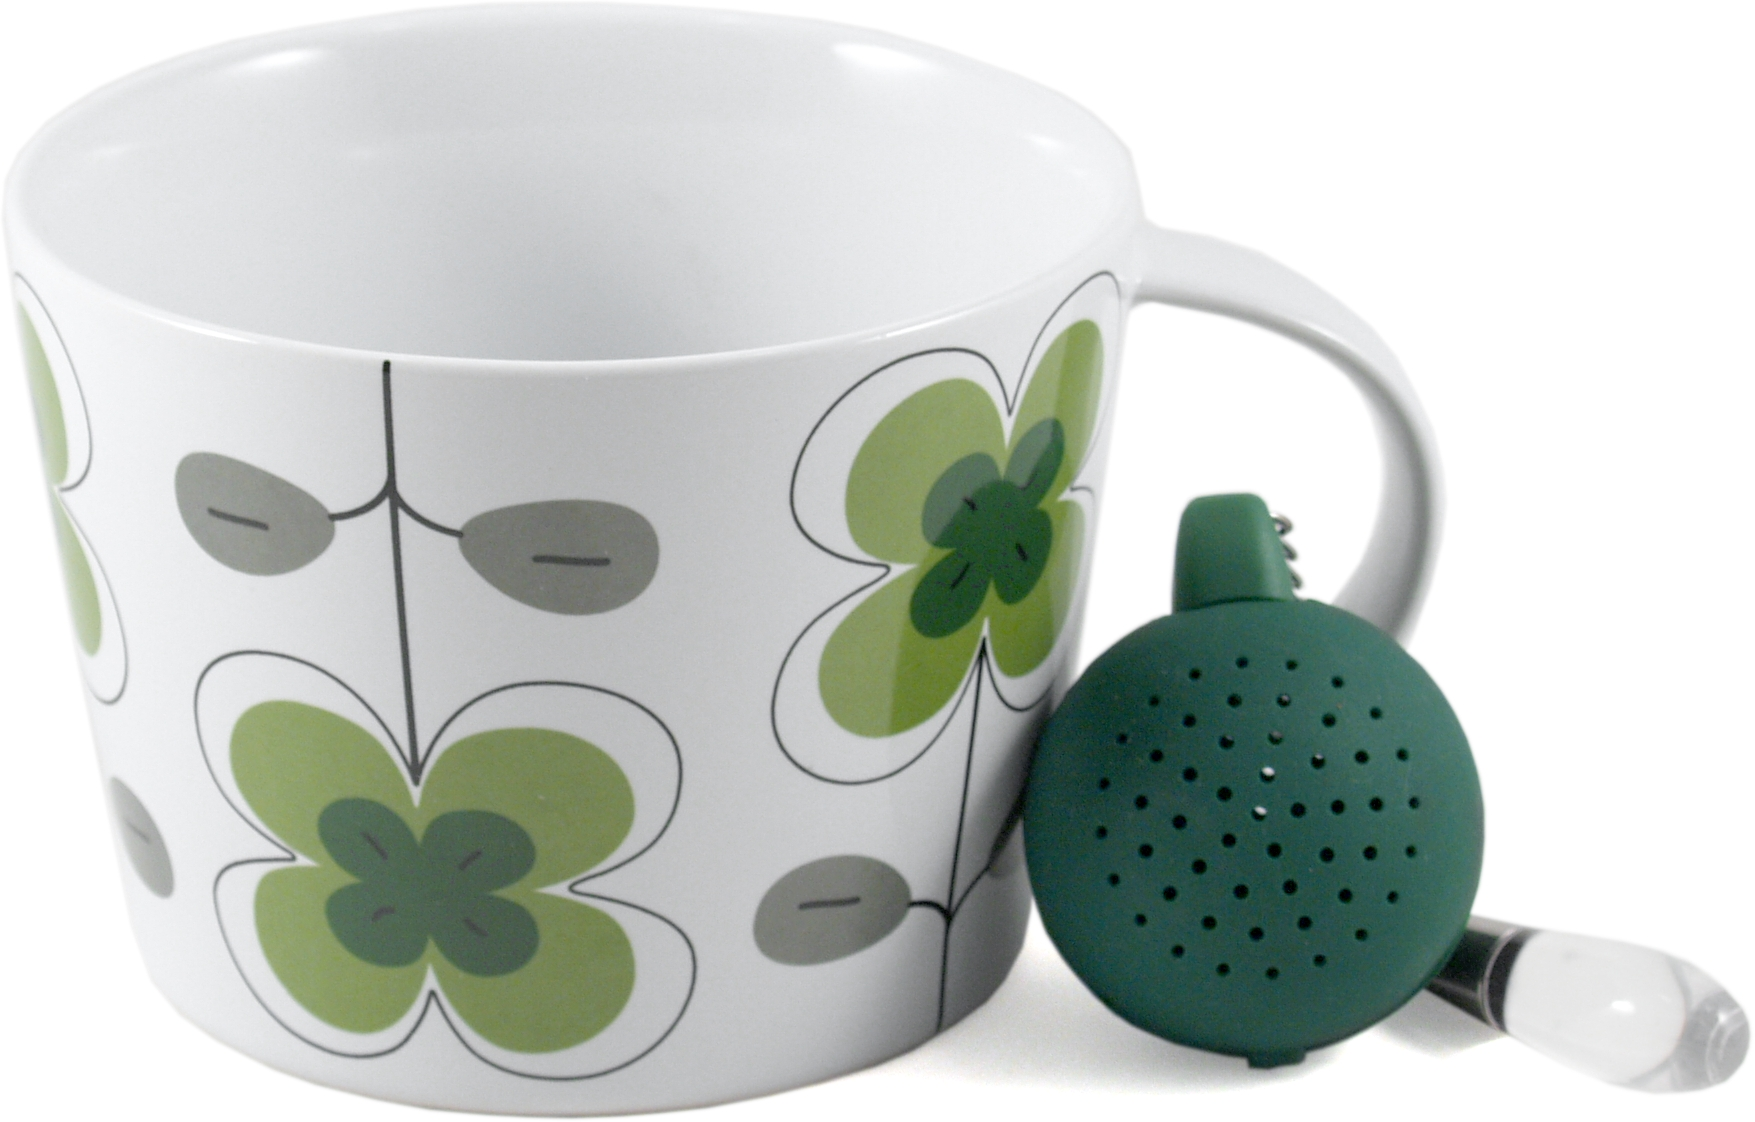 Sagaform White and Green Stoneware Clover Tea Set